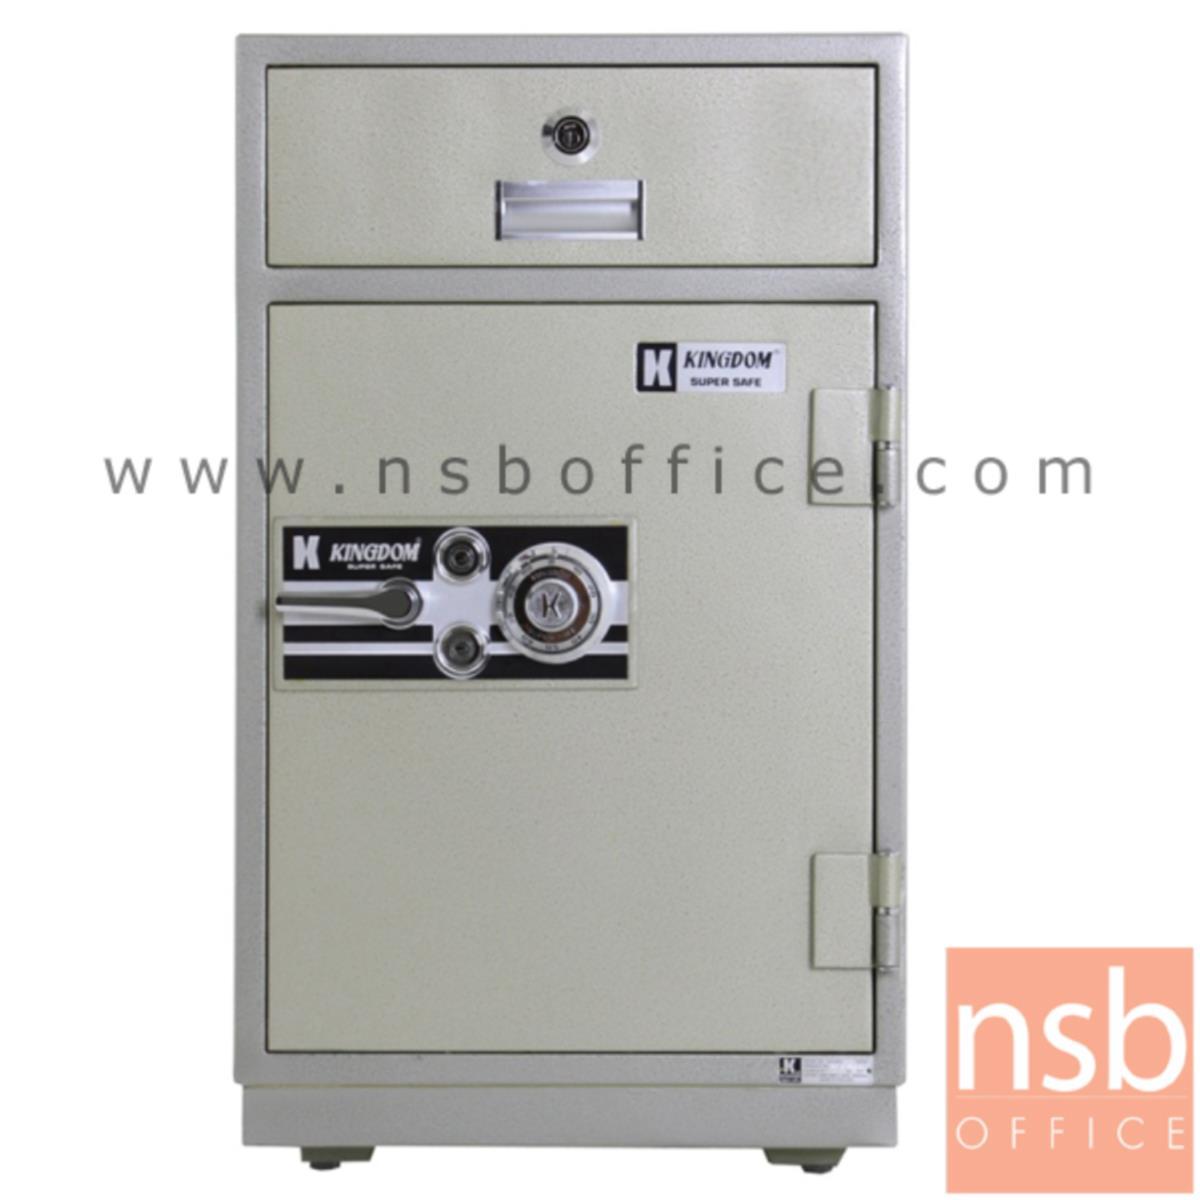 F04A006:ตู้เซฟแคชเชียร์ 160 กก. ยี่ห้อ KINGDOM รุ่น SAN-8253 (3 กุญแจ 1 รหัส)